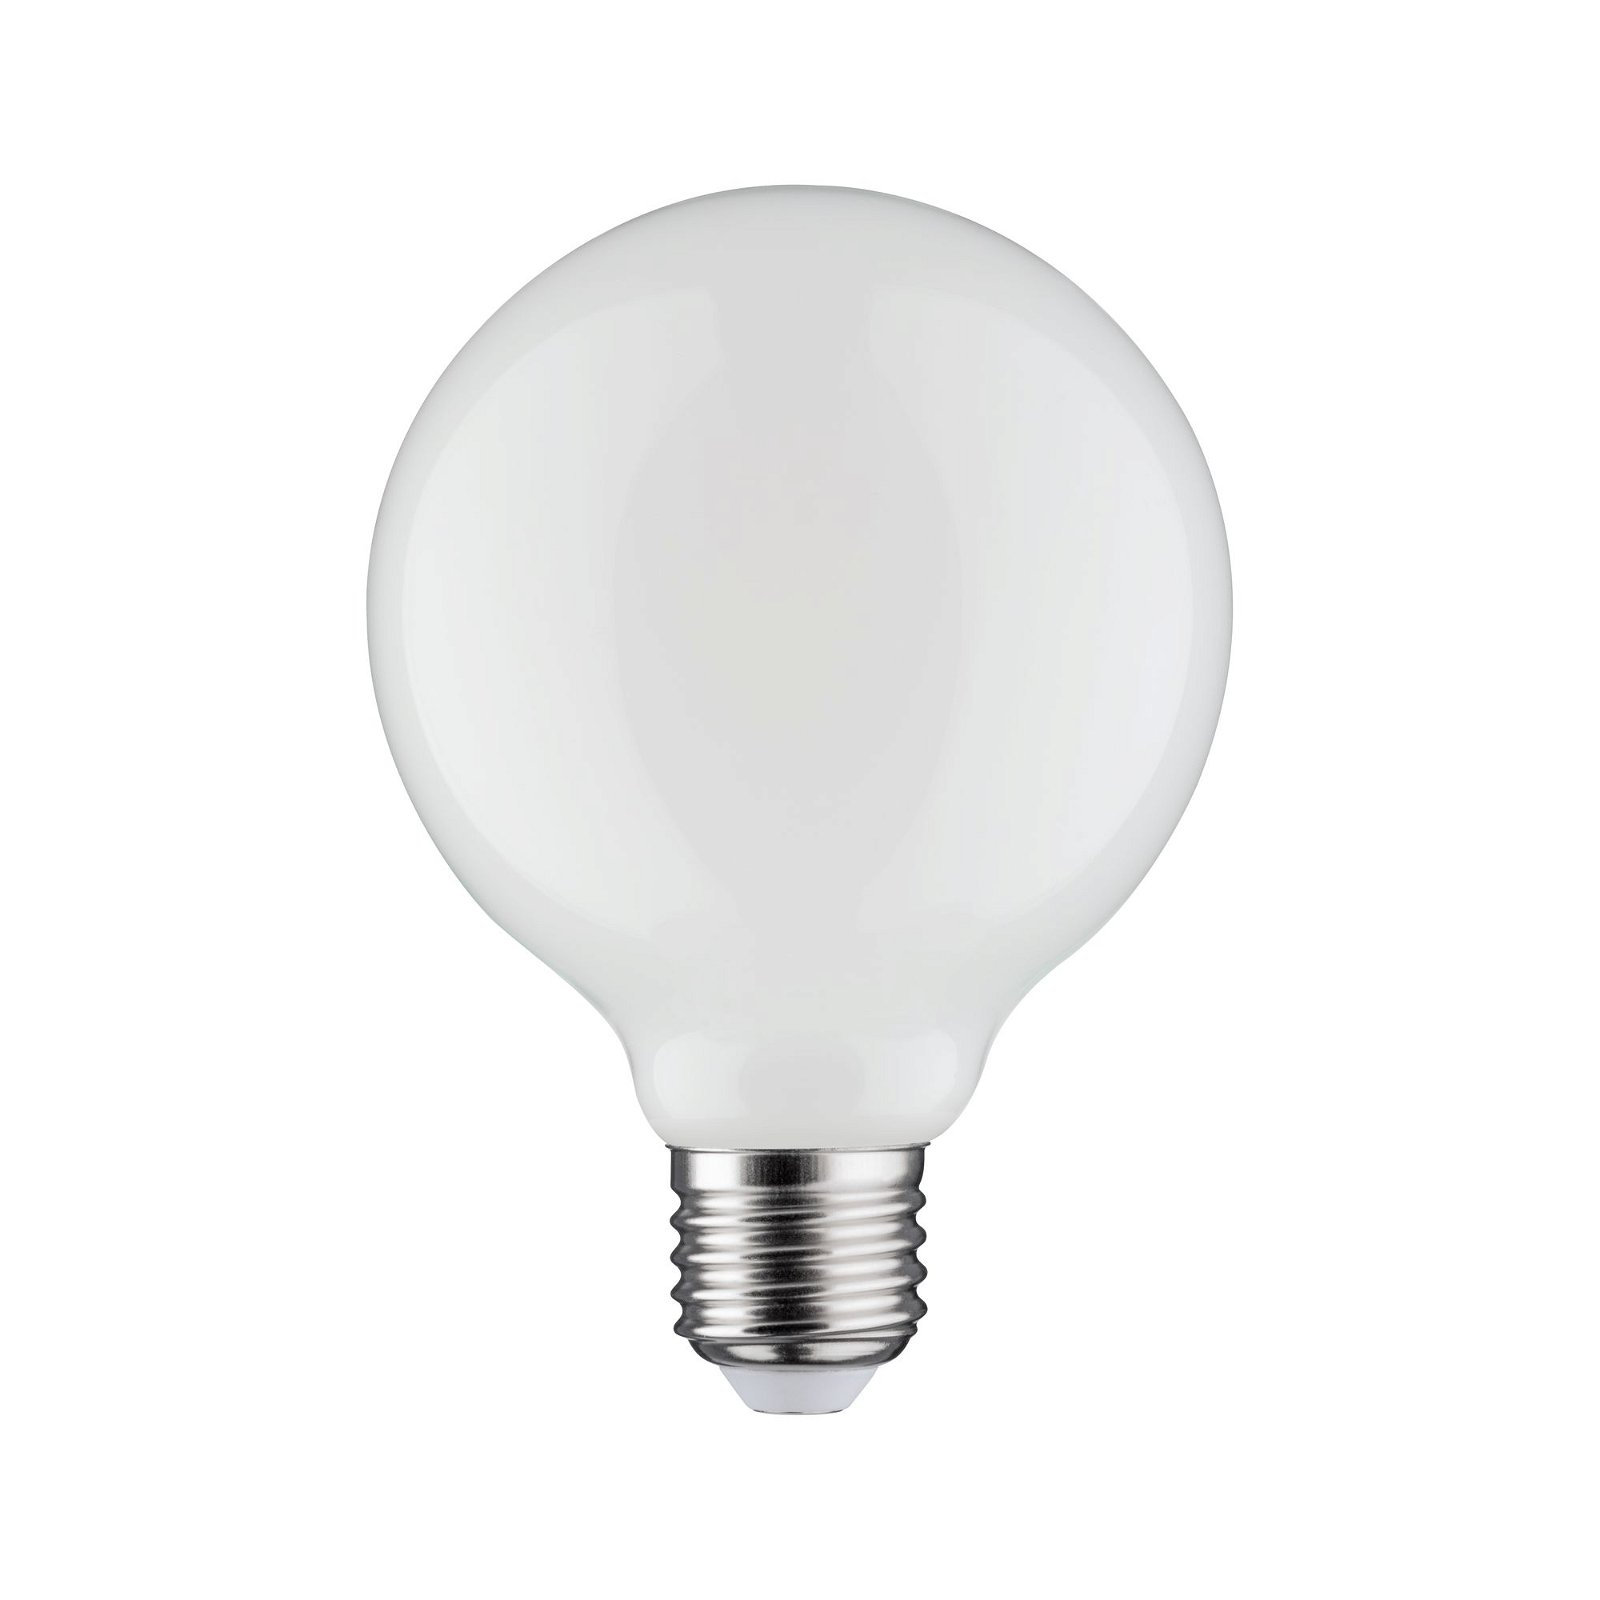 LED Birne Smart Home Zigbee Filament E27 230V 806lm 7W Tunable White Opal